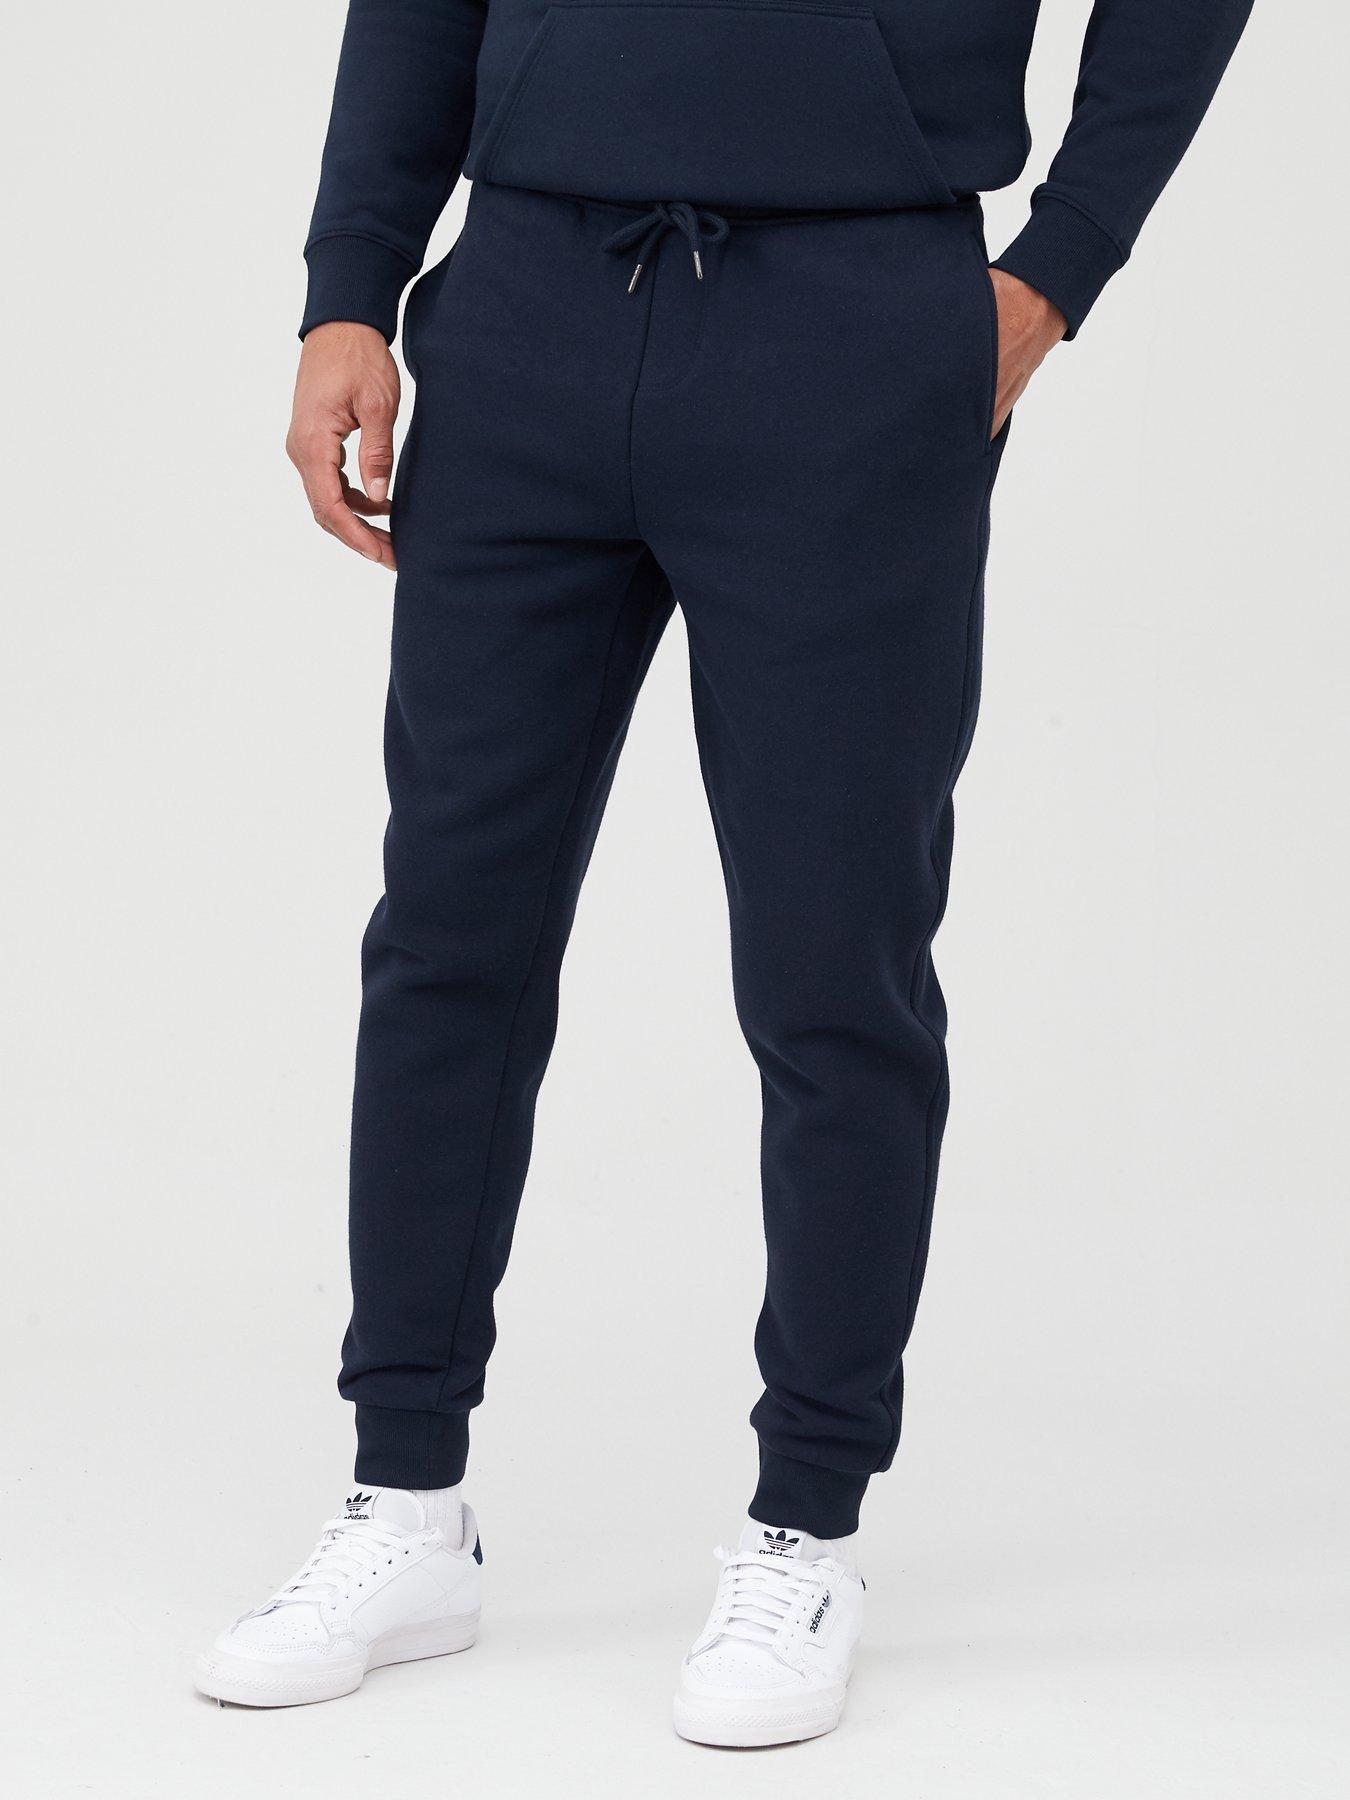 sizes L XL 2XL CANTERBURY MENS TONAL SIDE PANEL CUFFED HEM TRACK PANTS